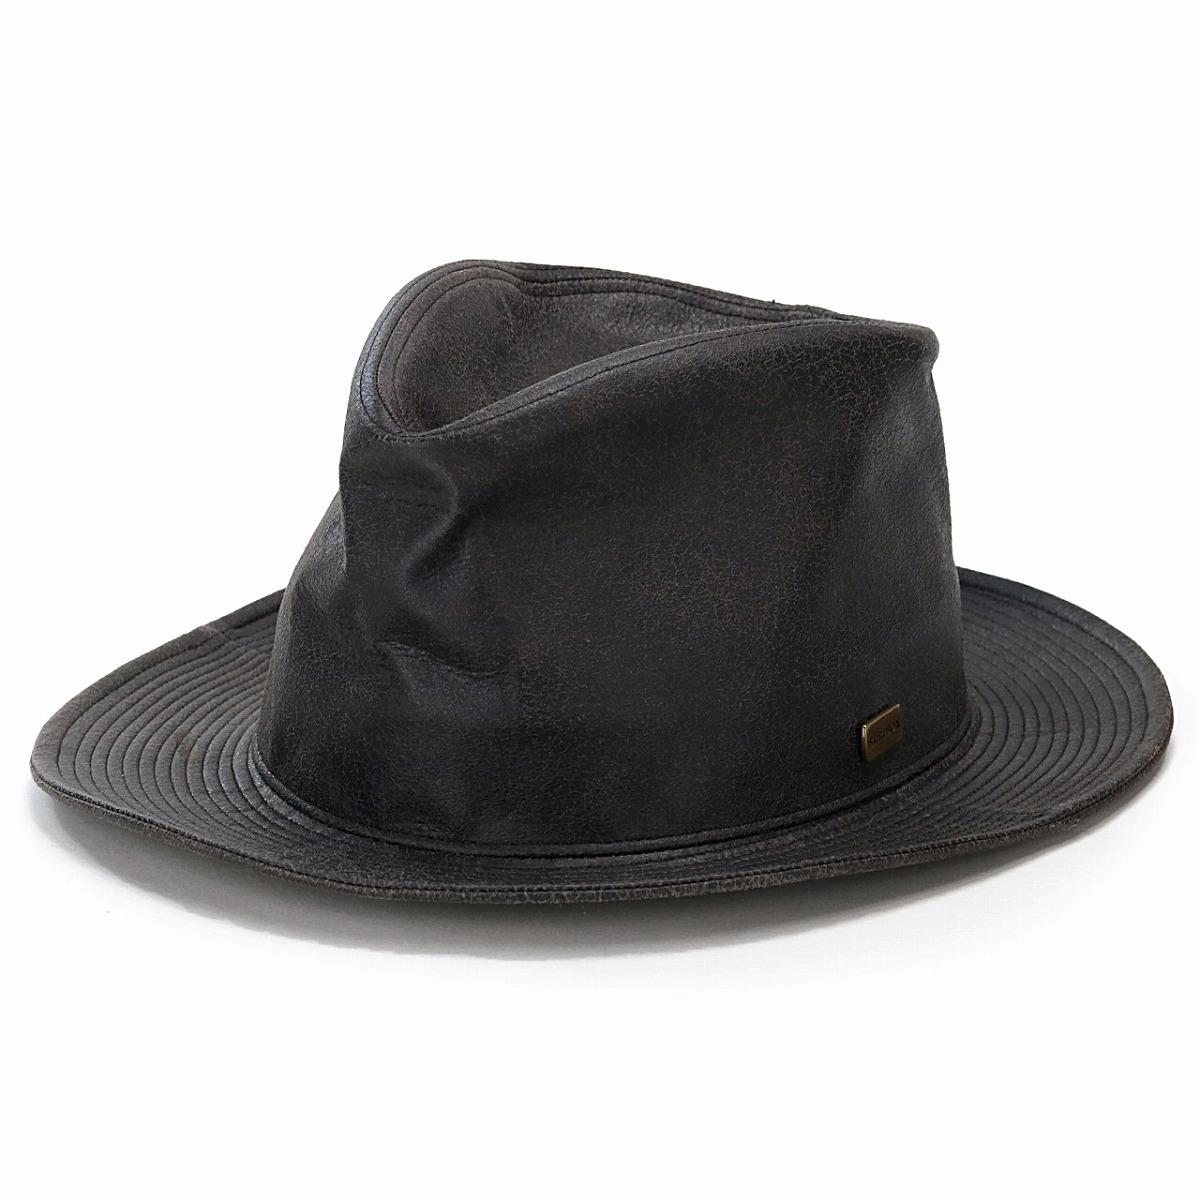 302d0818 ELEHELM HAT STORE: 58cm 60cm STETSON gentleman soft felt hat Shin pull tea  brown [fedora] stetson hat mail order man hat Christmas gift present made  in ...